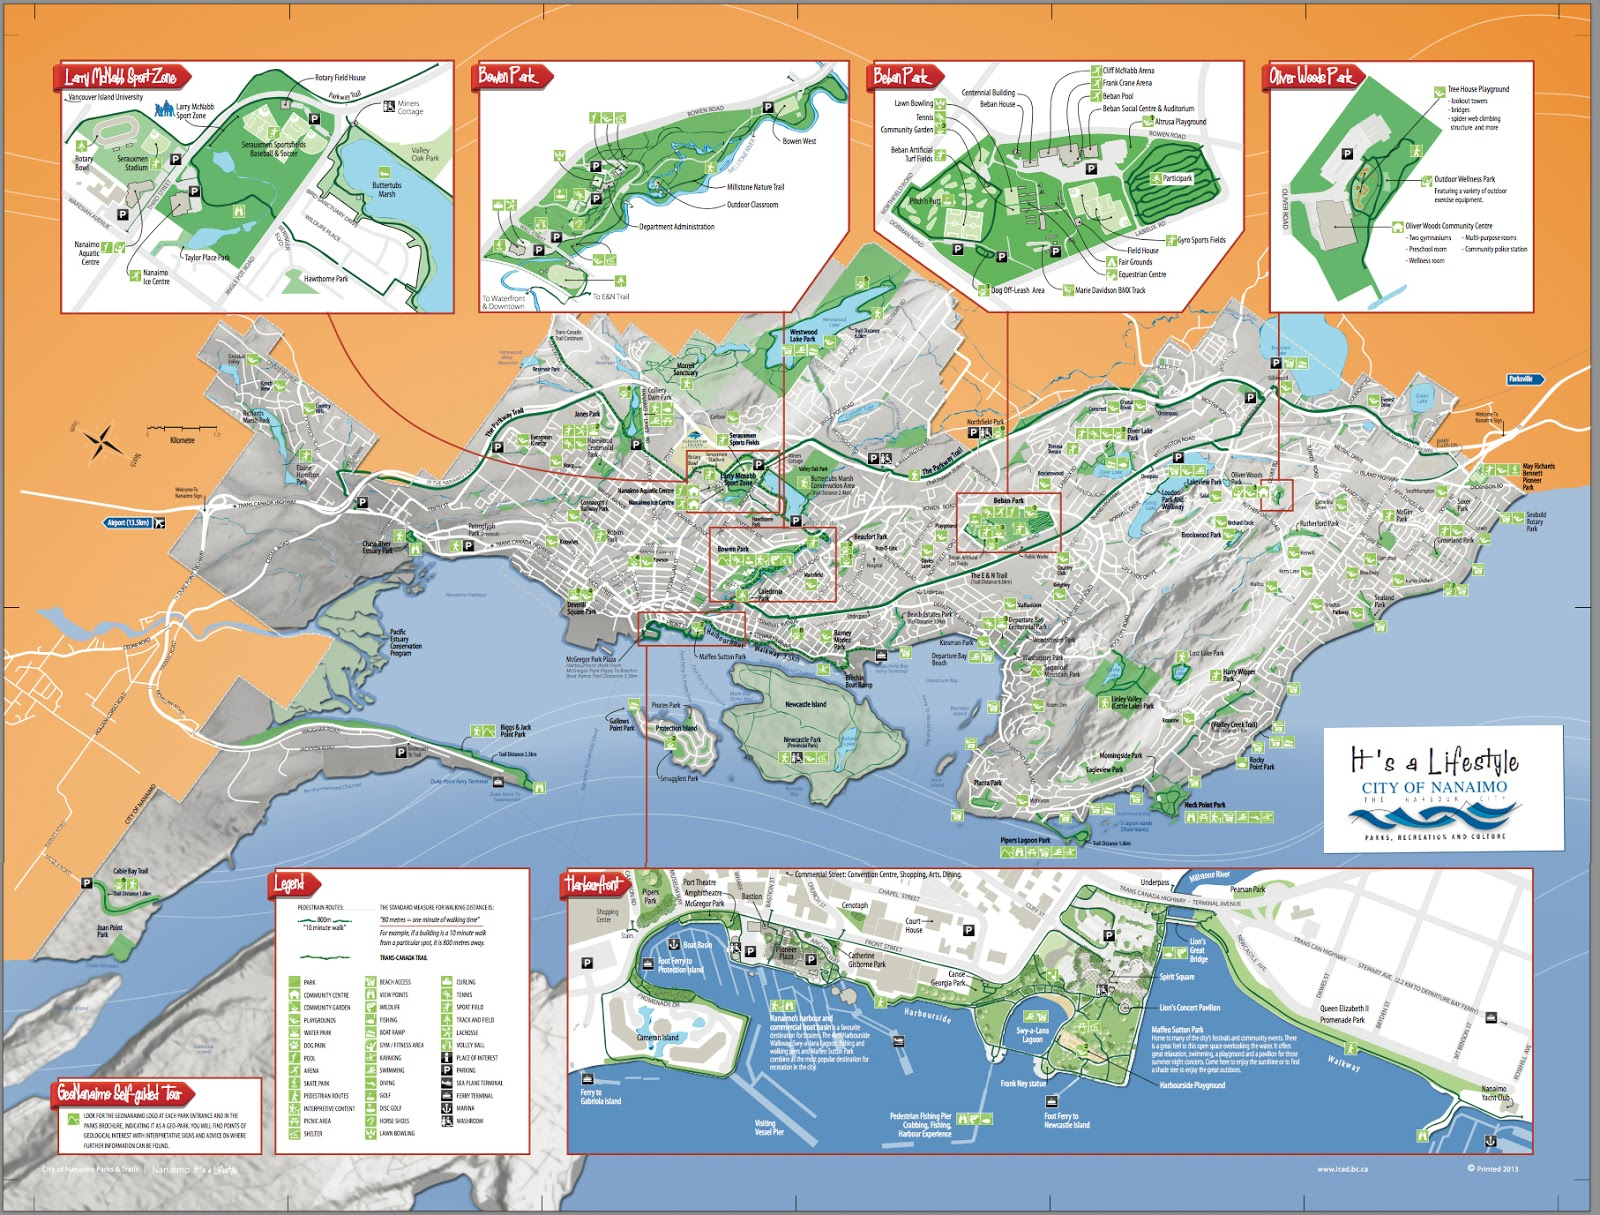 City Of Nanaimo Map Nanaimo – City Of Nanaimo Map